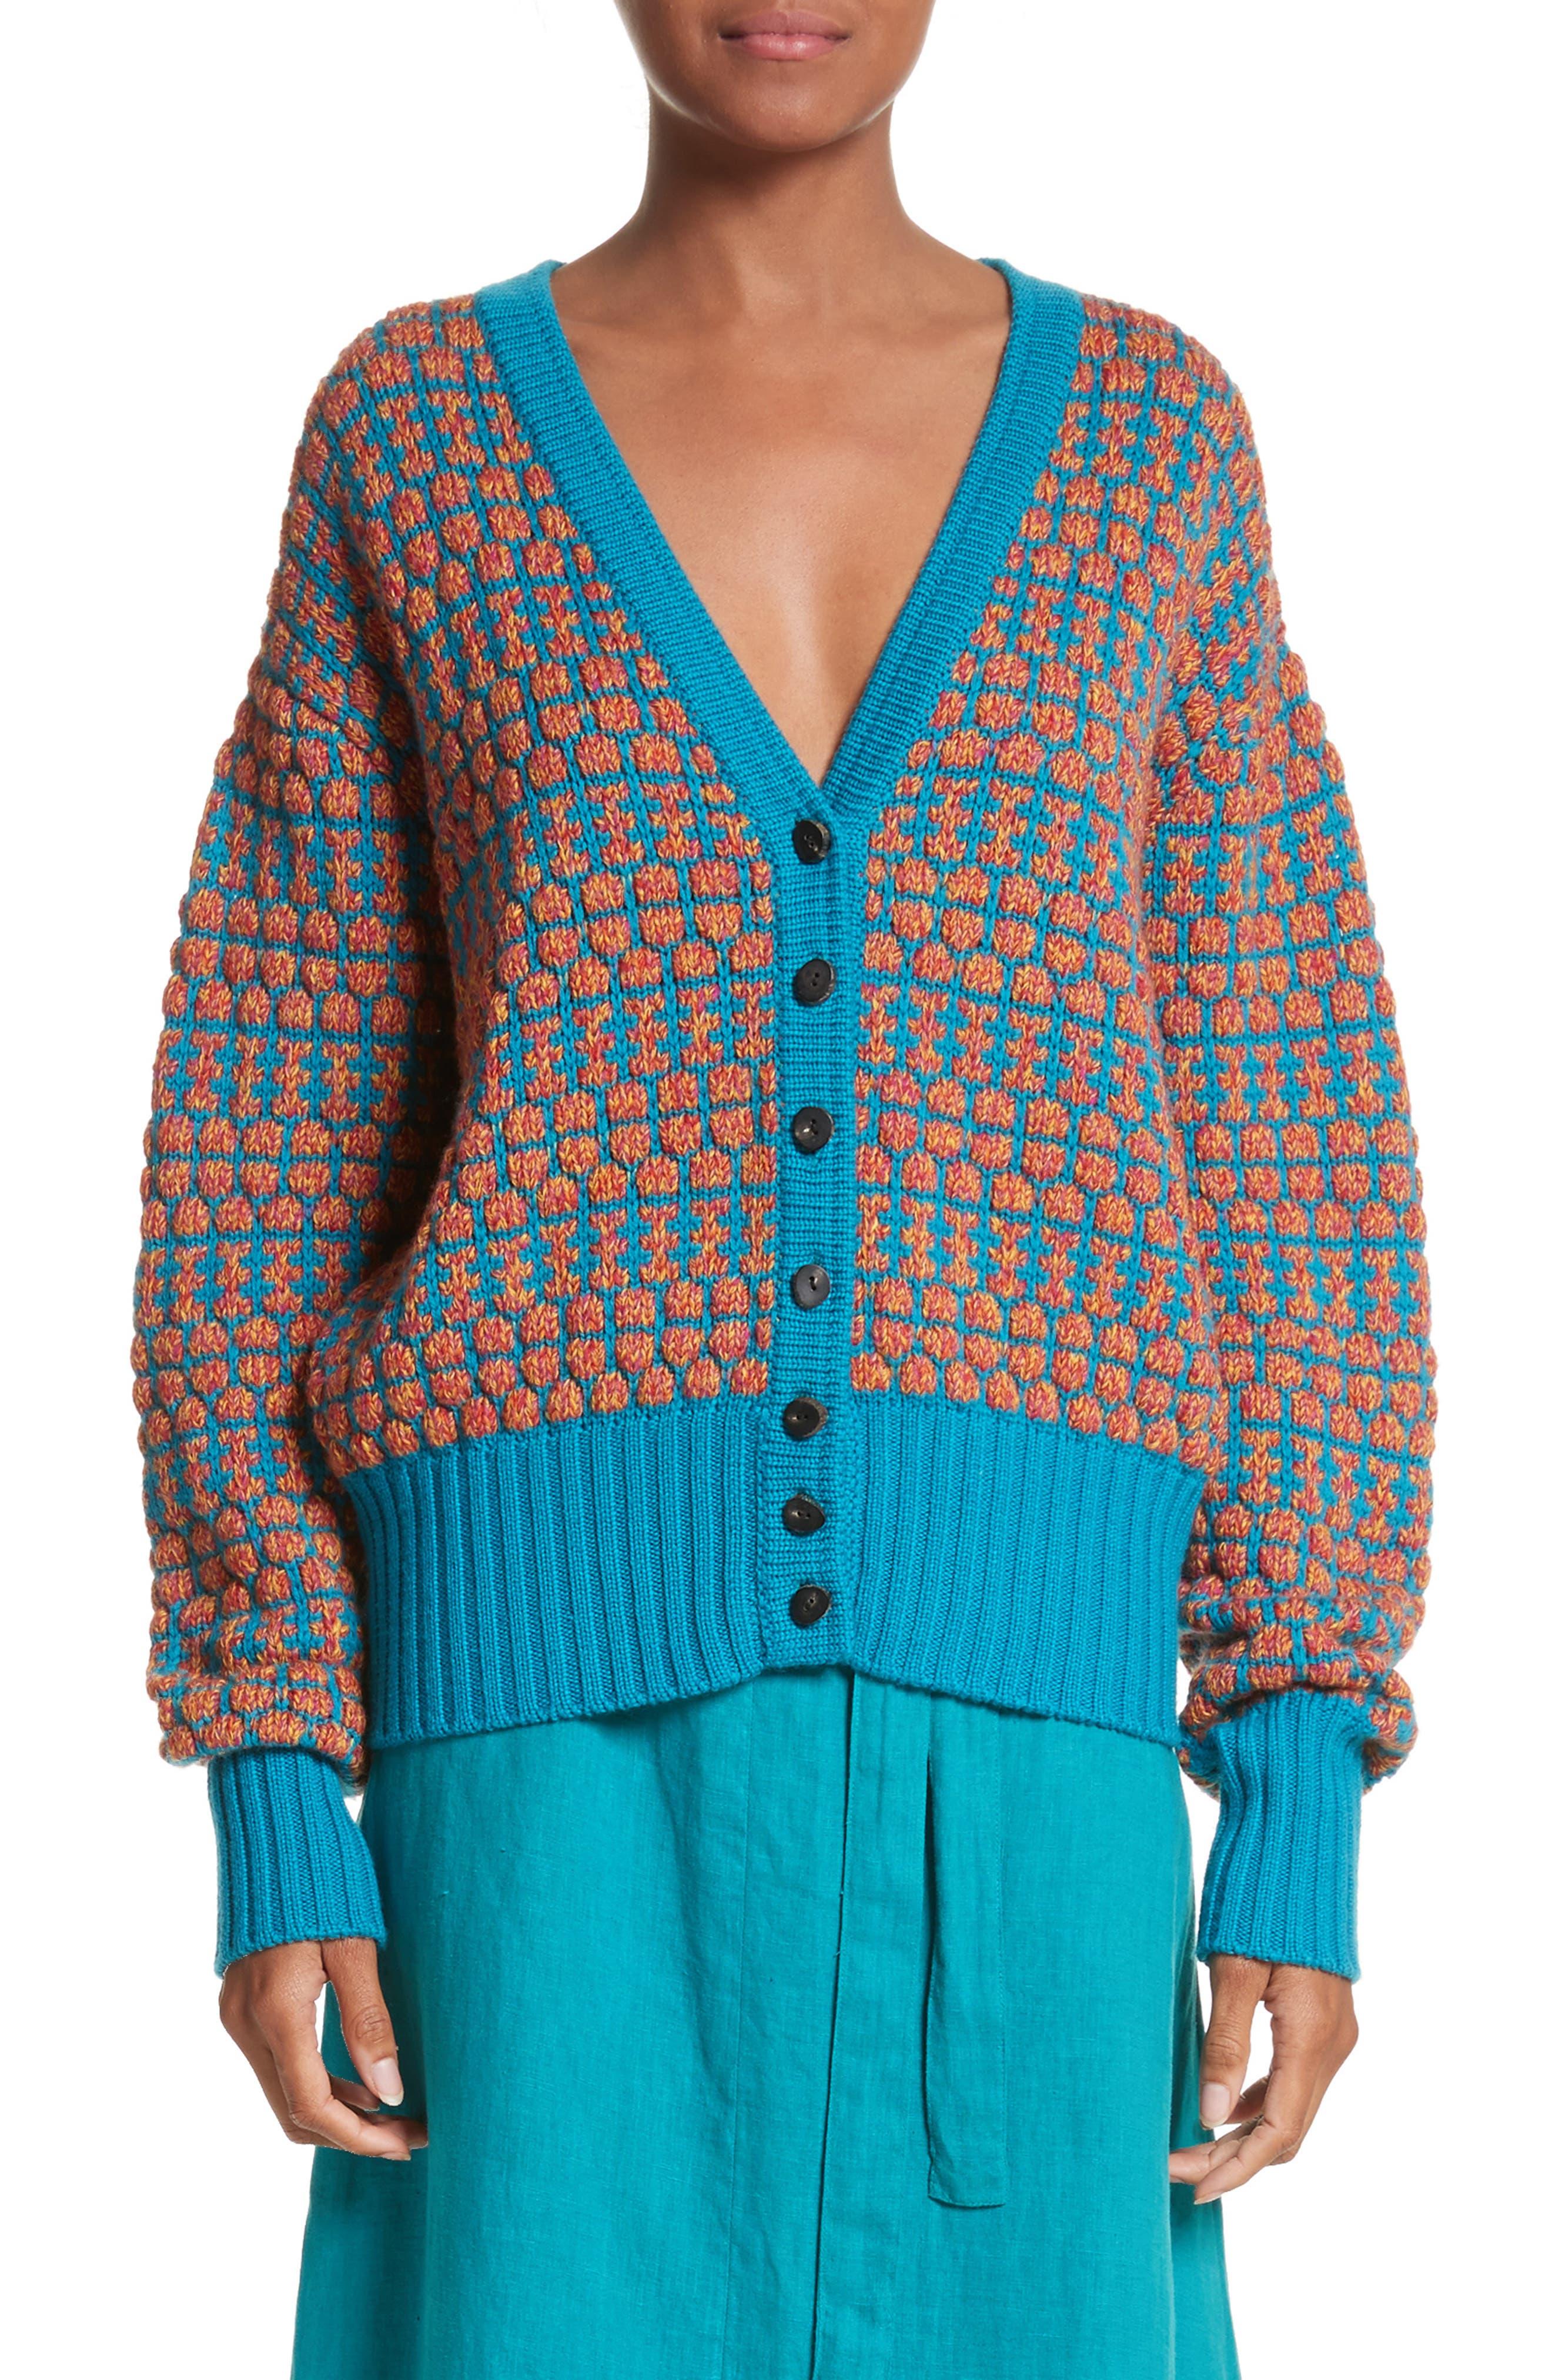 Izee Floral Button Cardigan,                         Main,                         color, Flower Print